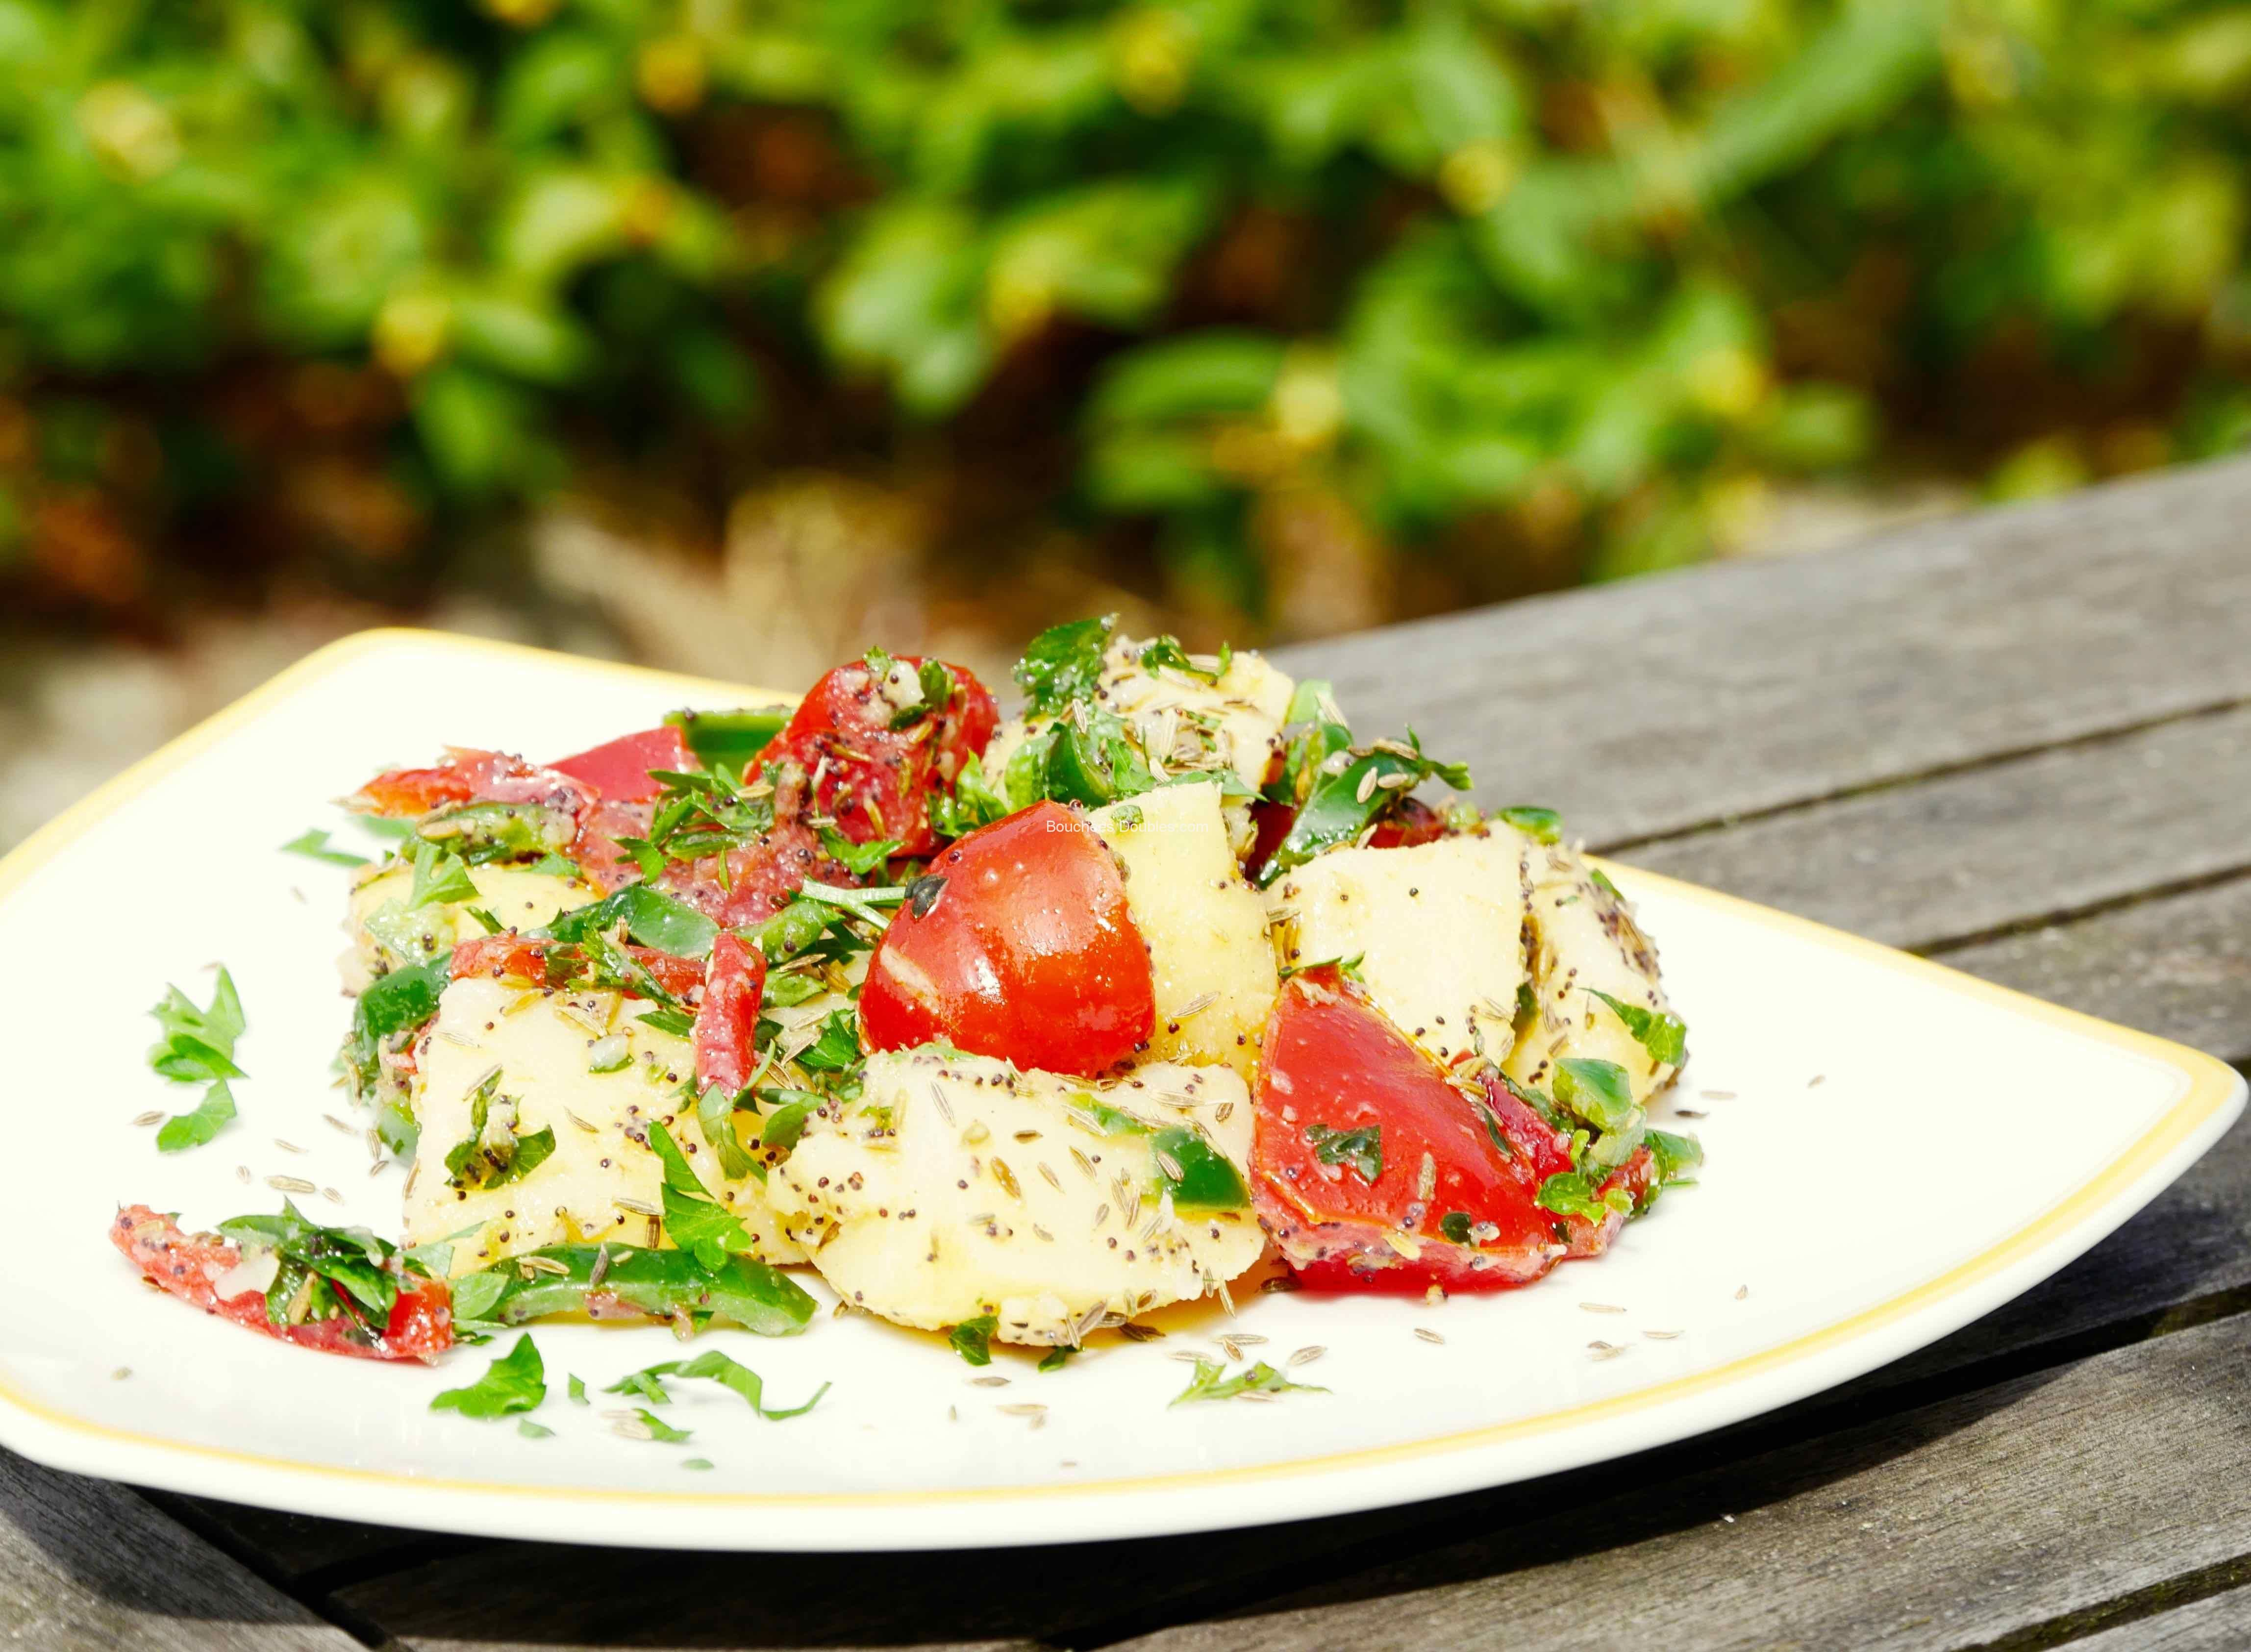 Salade Alcaline Croquante Craquante Et Fondante Recette Alcaline